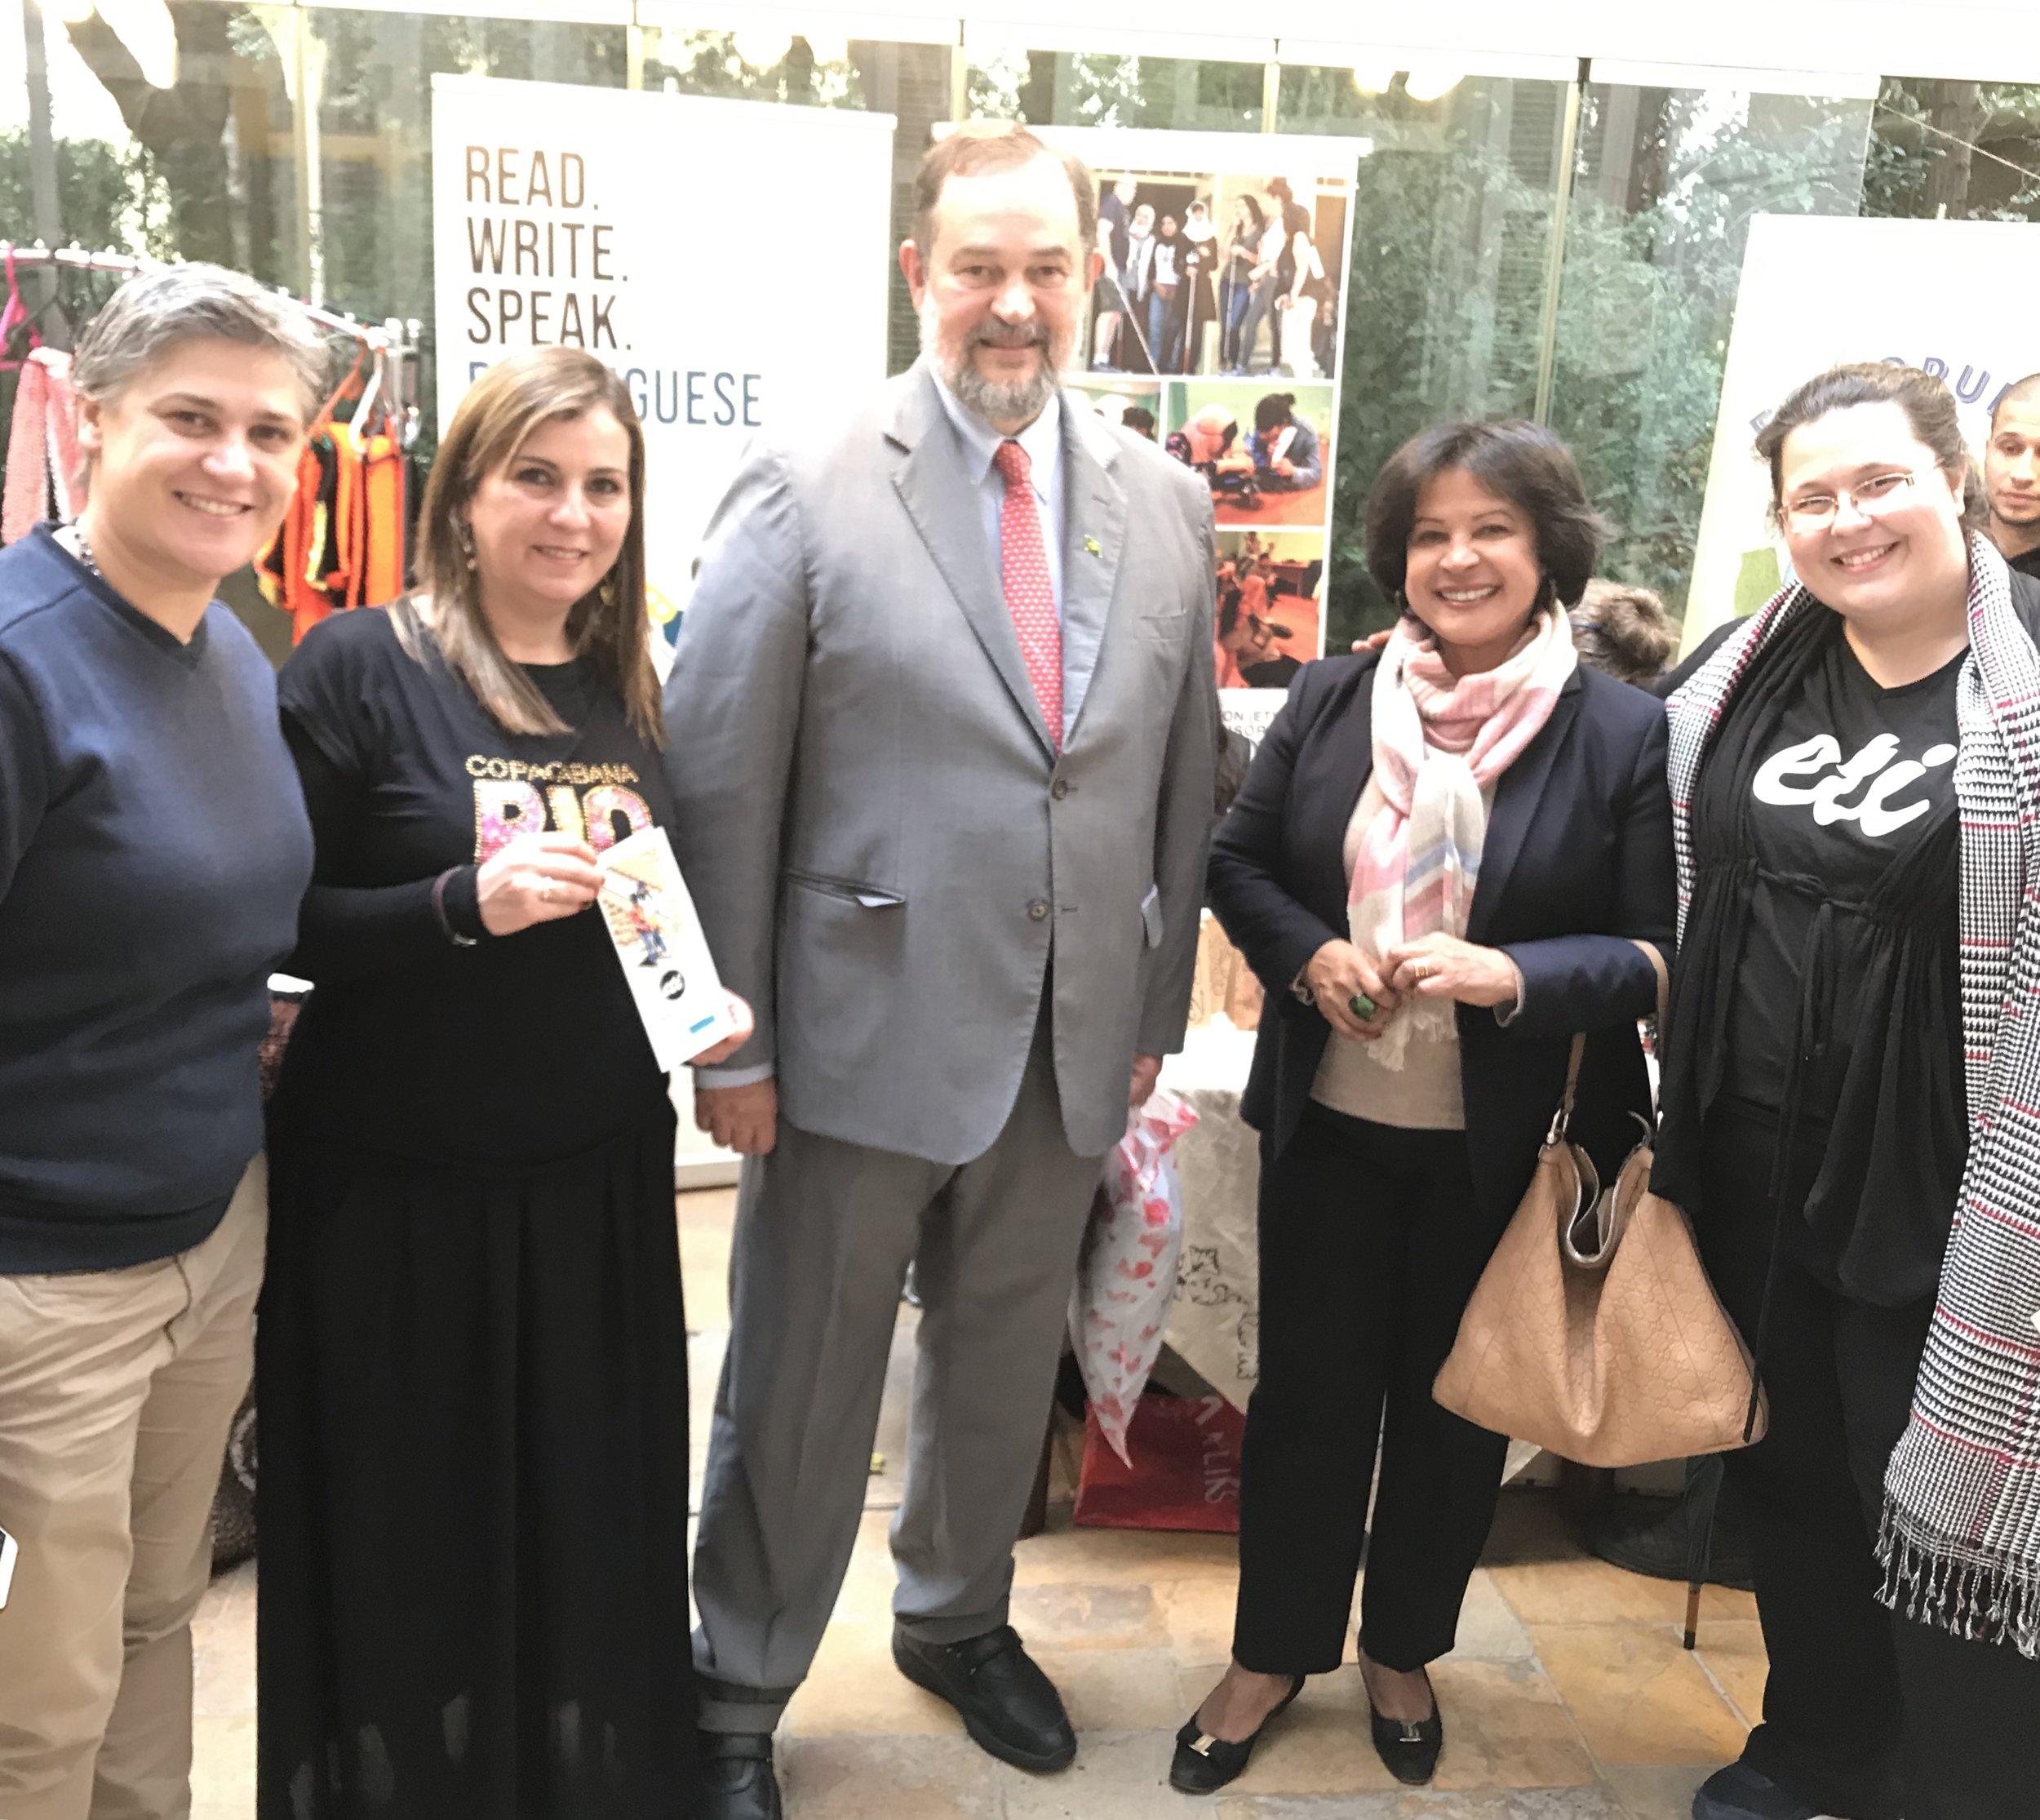 Brazilian Ambassador Paulo Cordeiro and his wife Vera Estrella Cordeiro Pinto (at center), with Arteiras do Brasil Coordinators Katia Awar and Carine Haddad (left) and ETI Country Director Anna Barbosa (right)